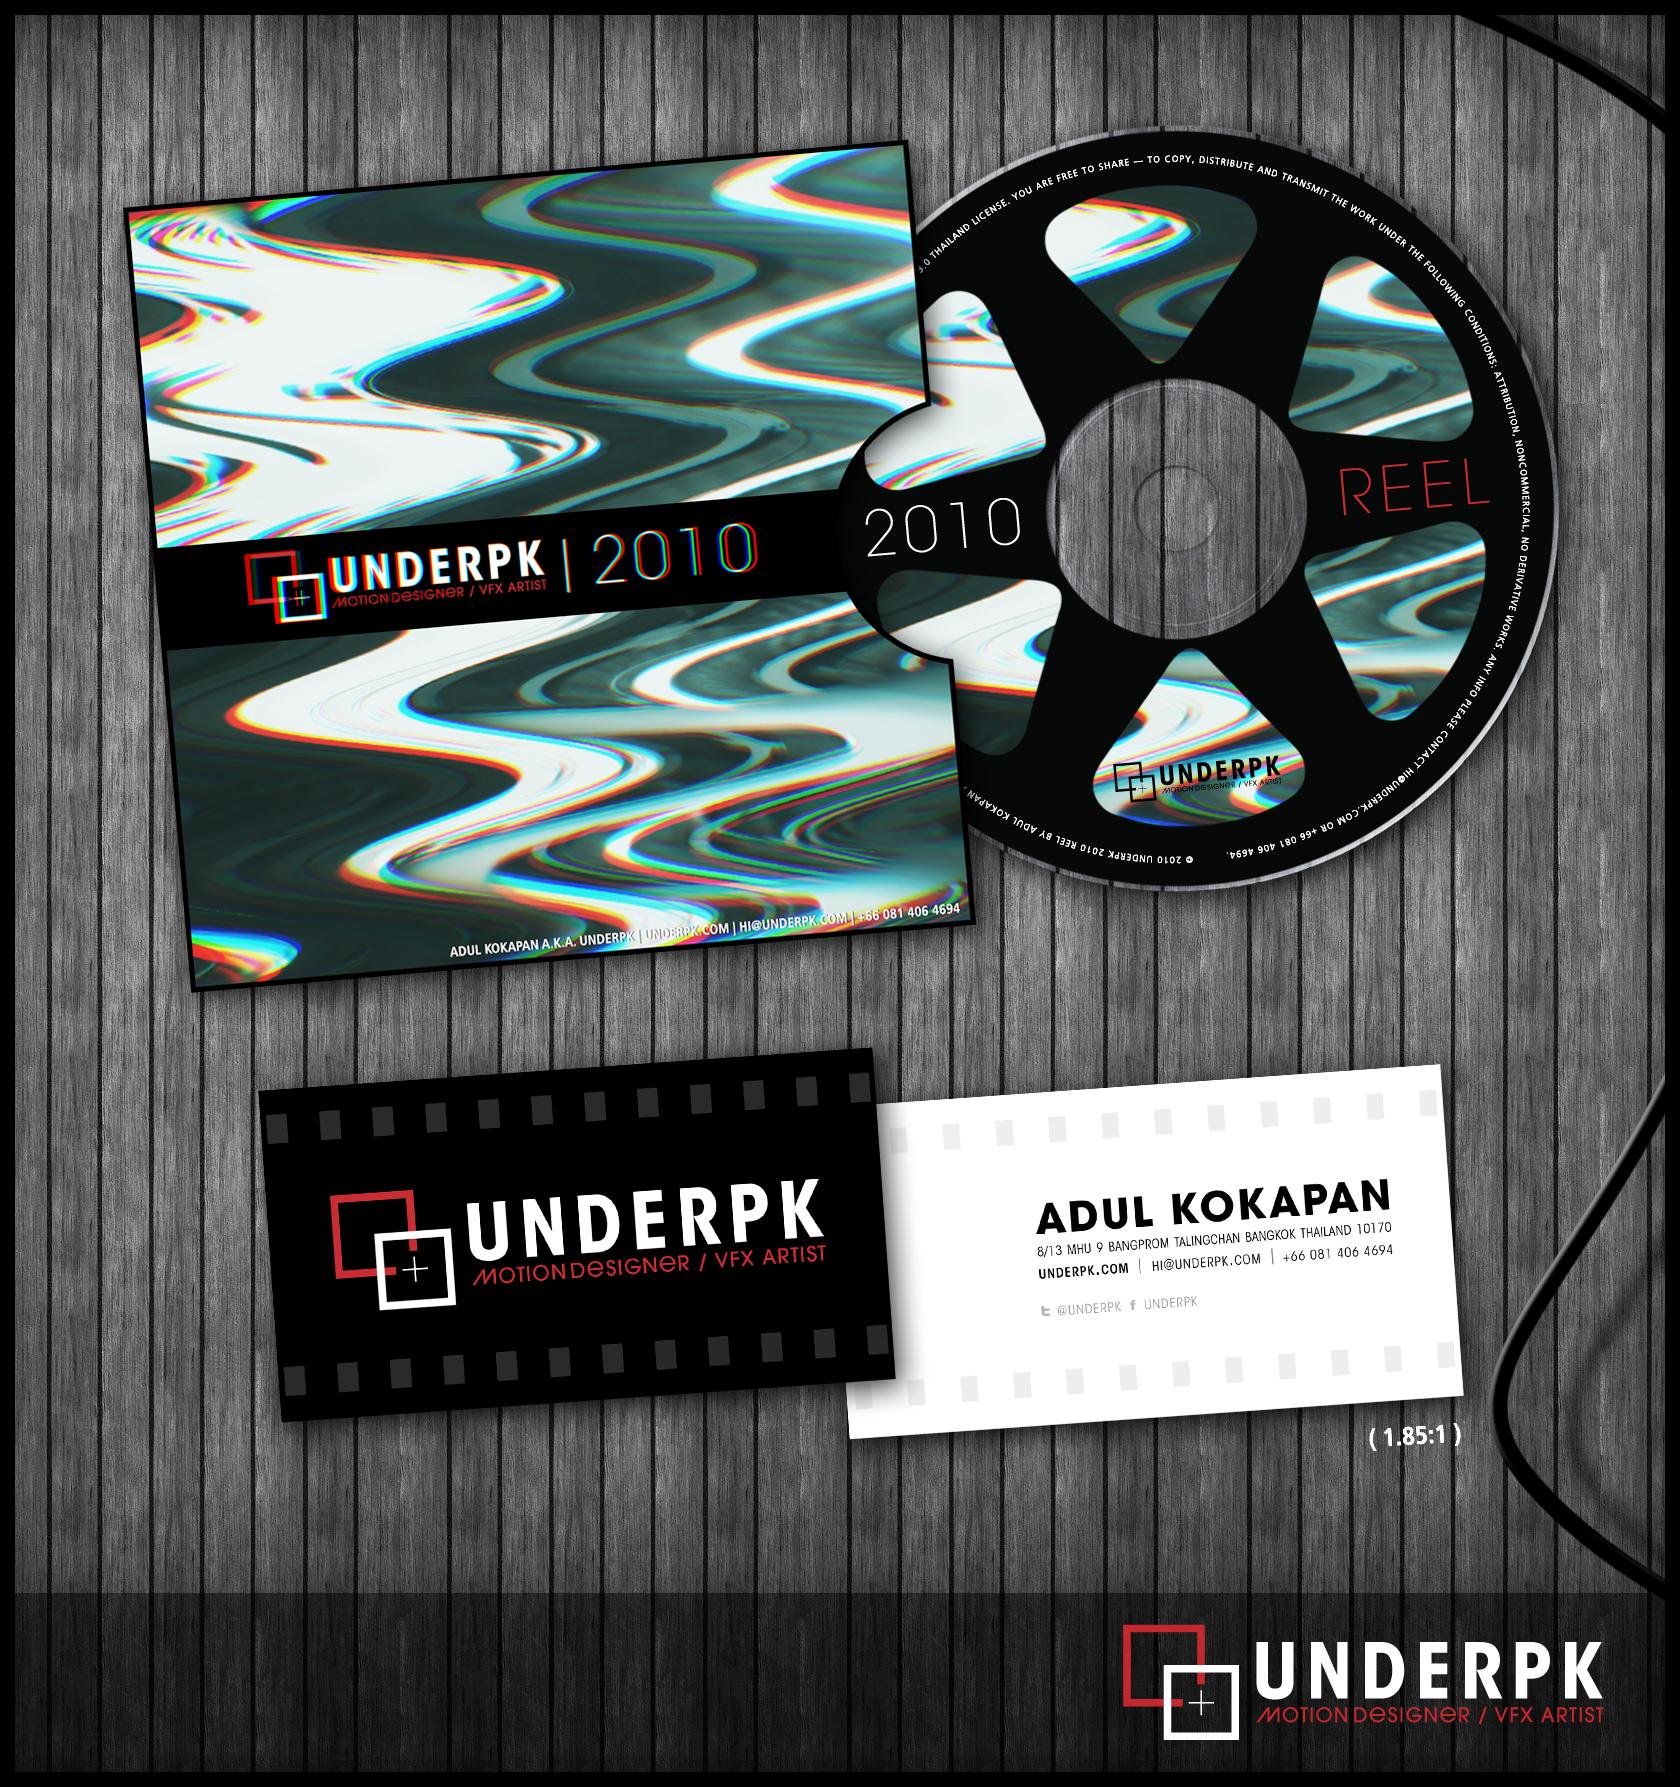 underpk brand identity by underpk